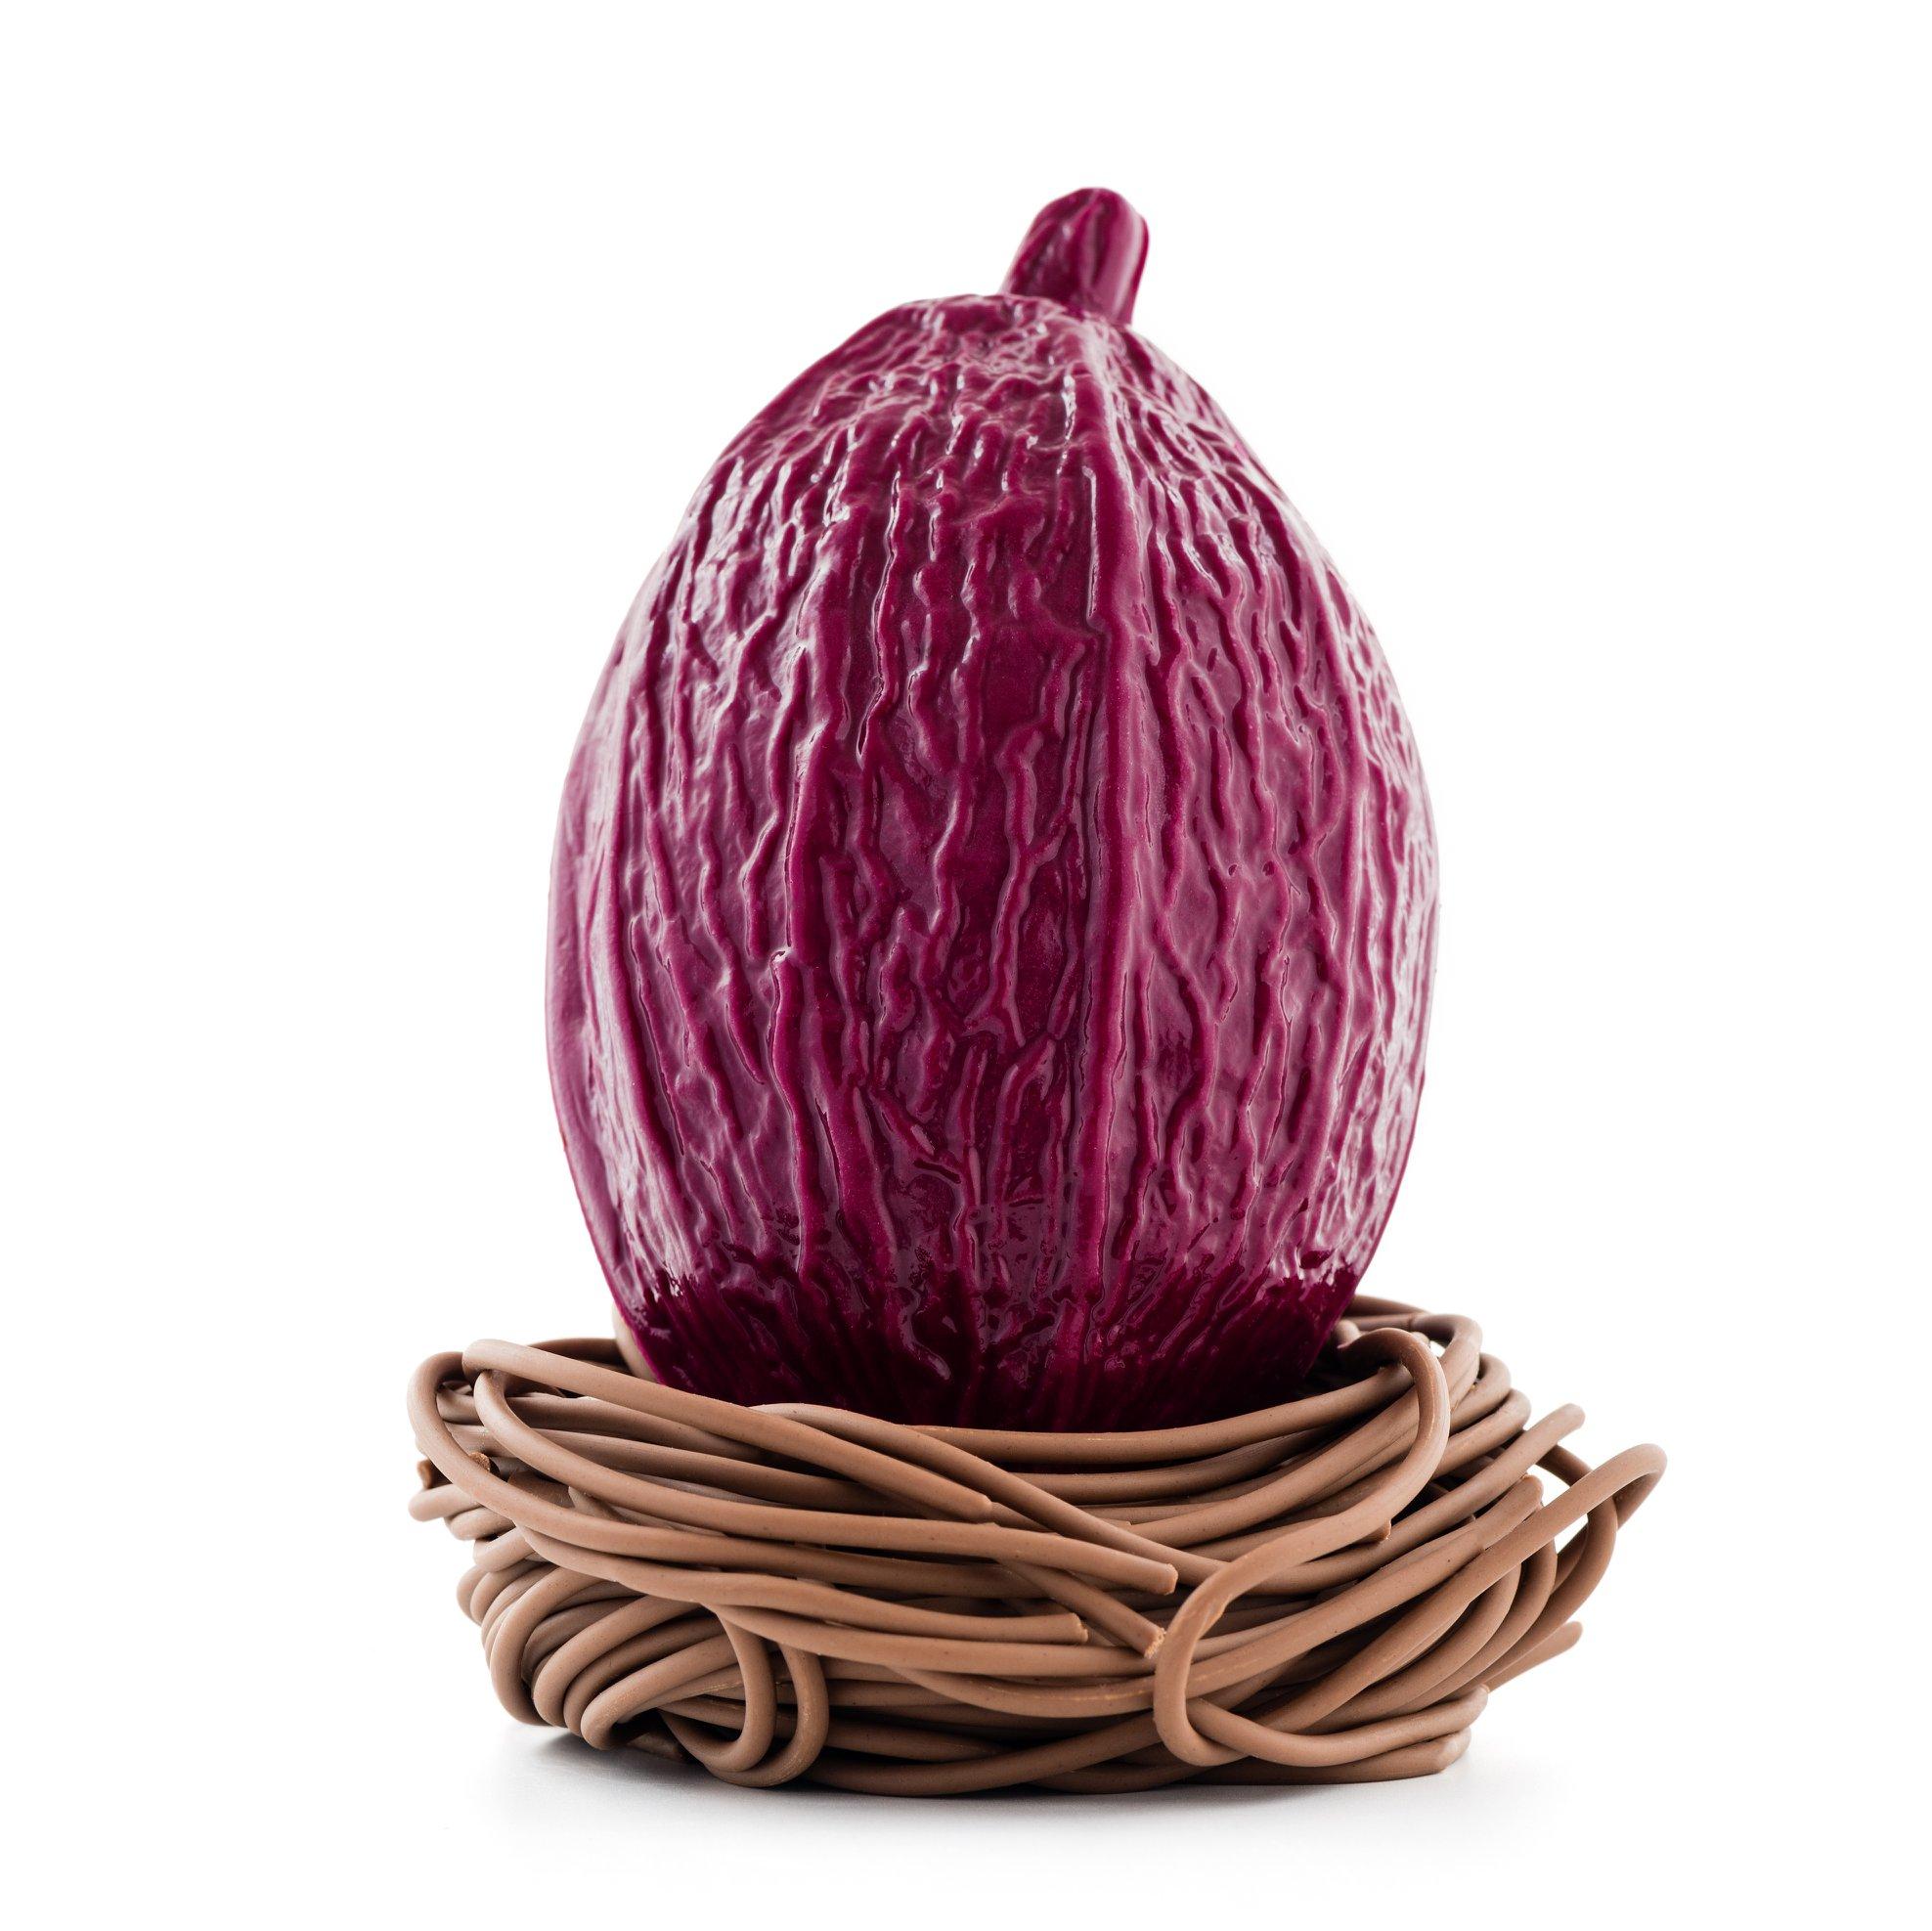 Soma Chocolate pod easter egg